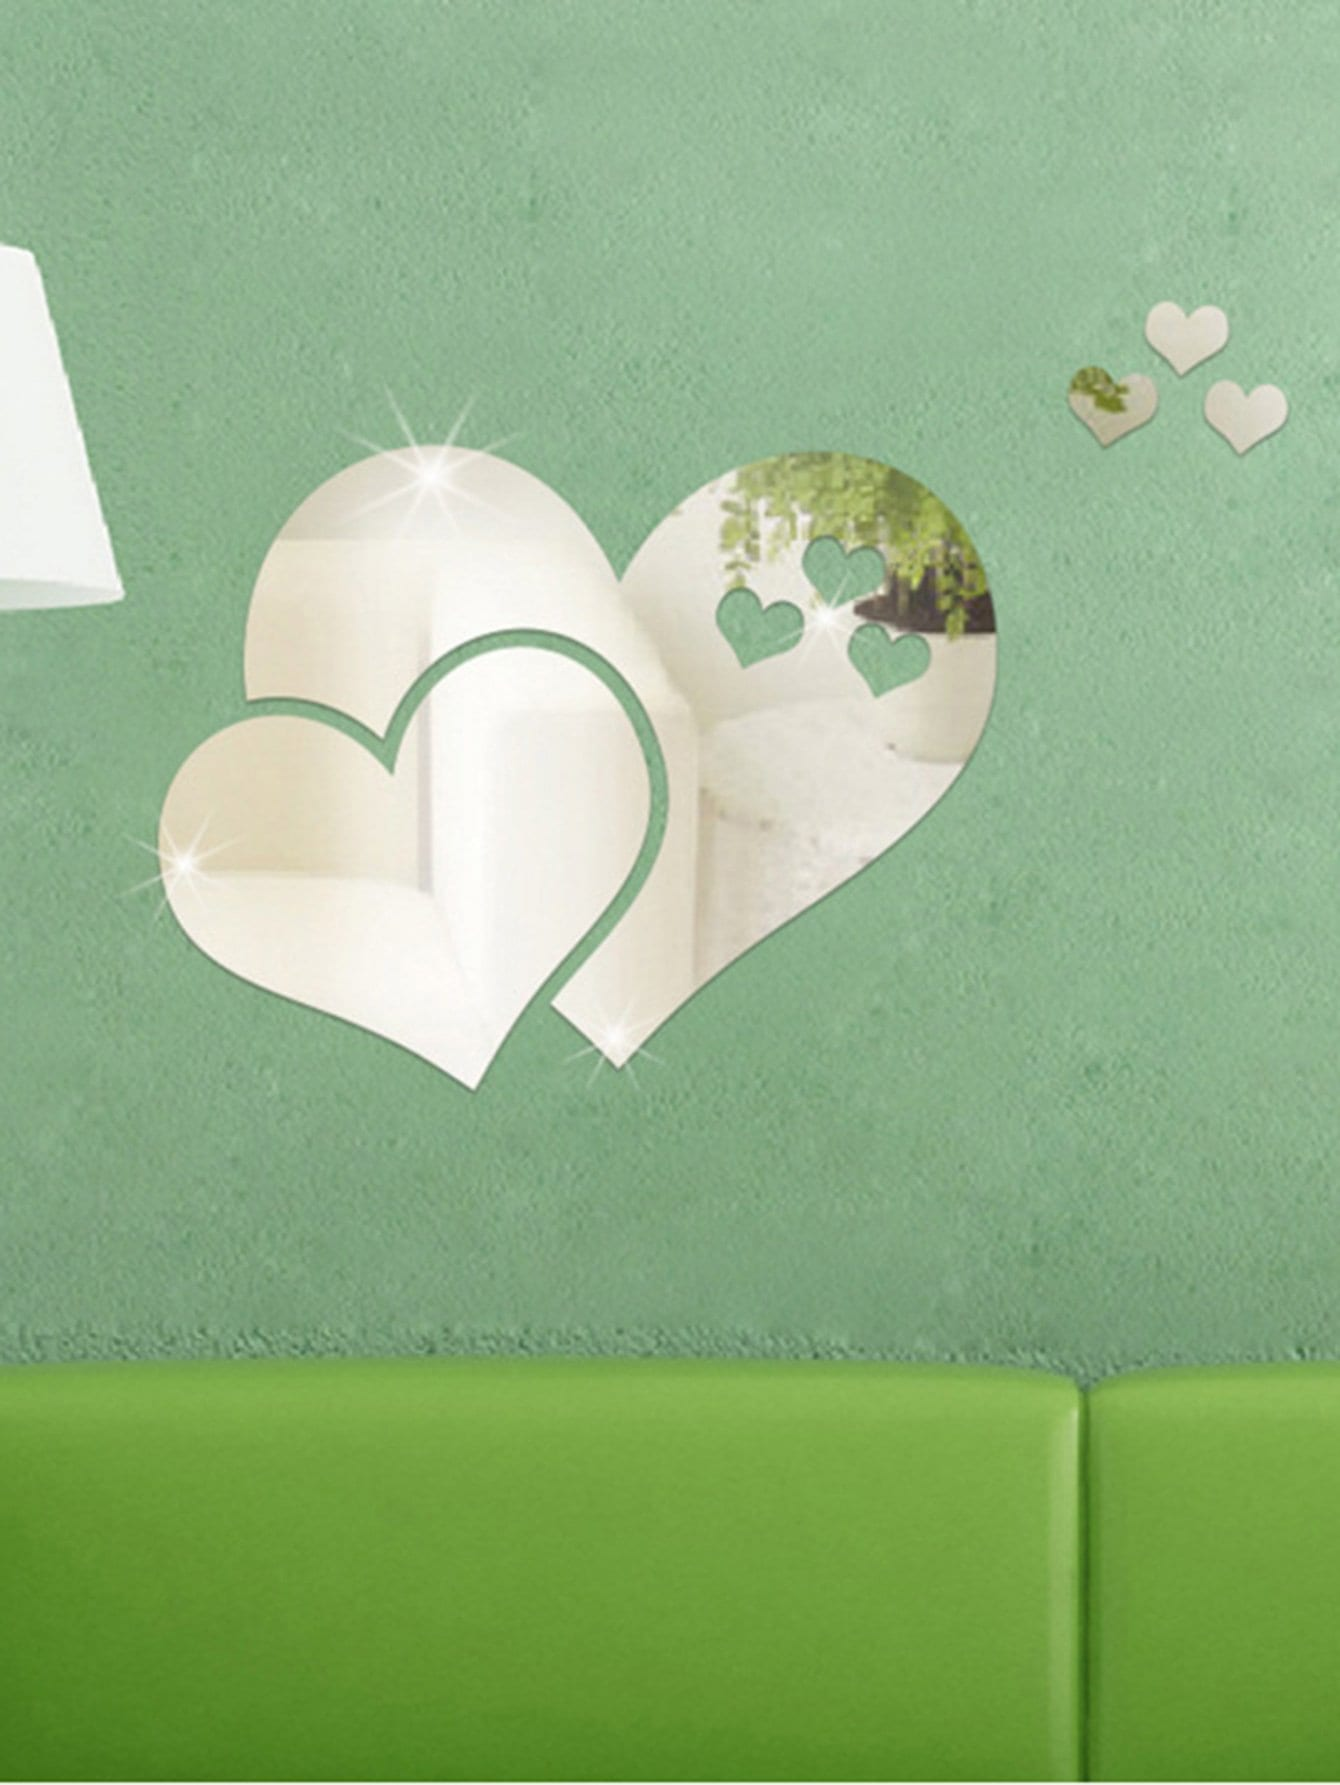 Heart Mirror Wall Sticker Set 5pcs 5pcs set 8